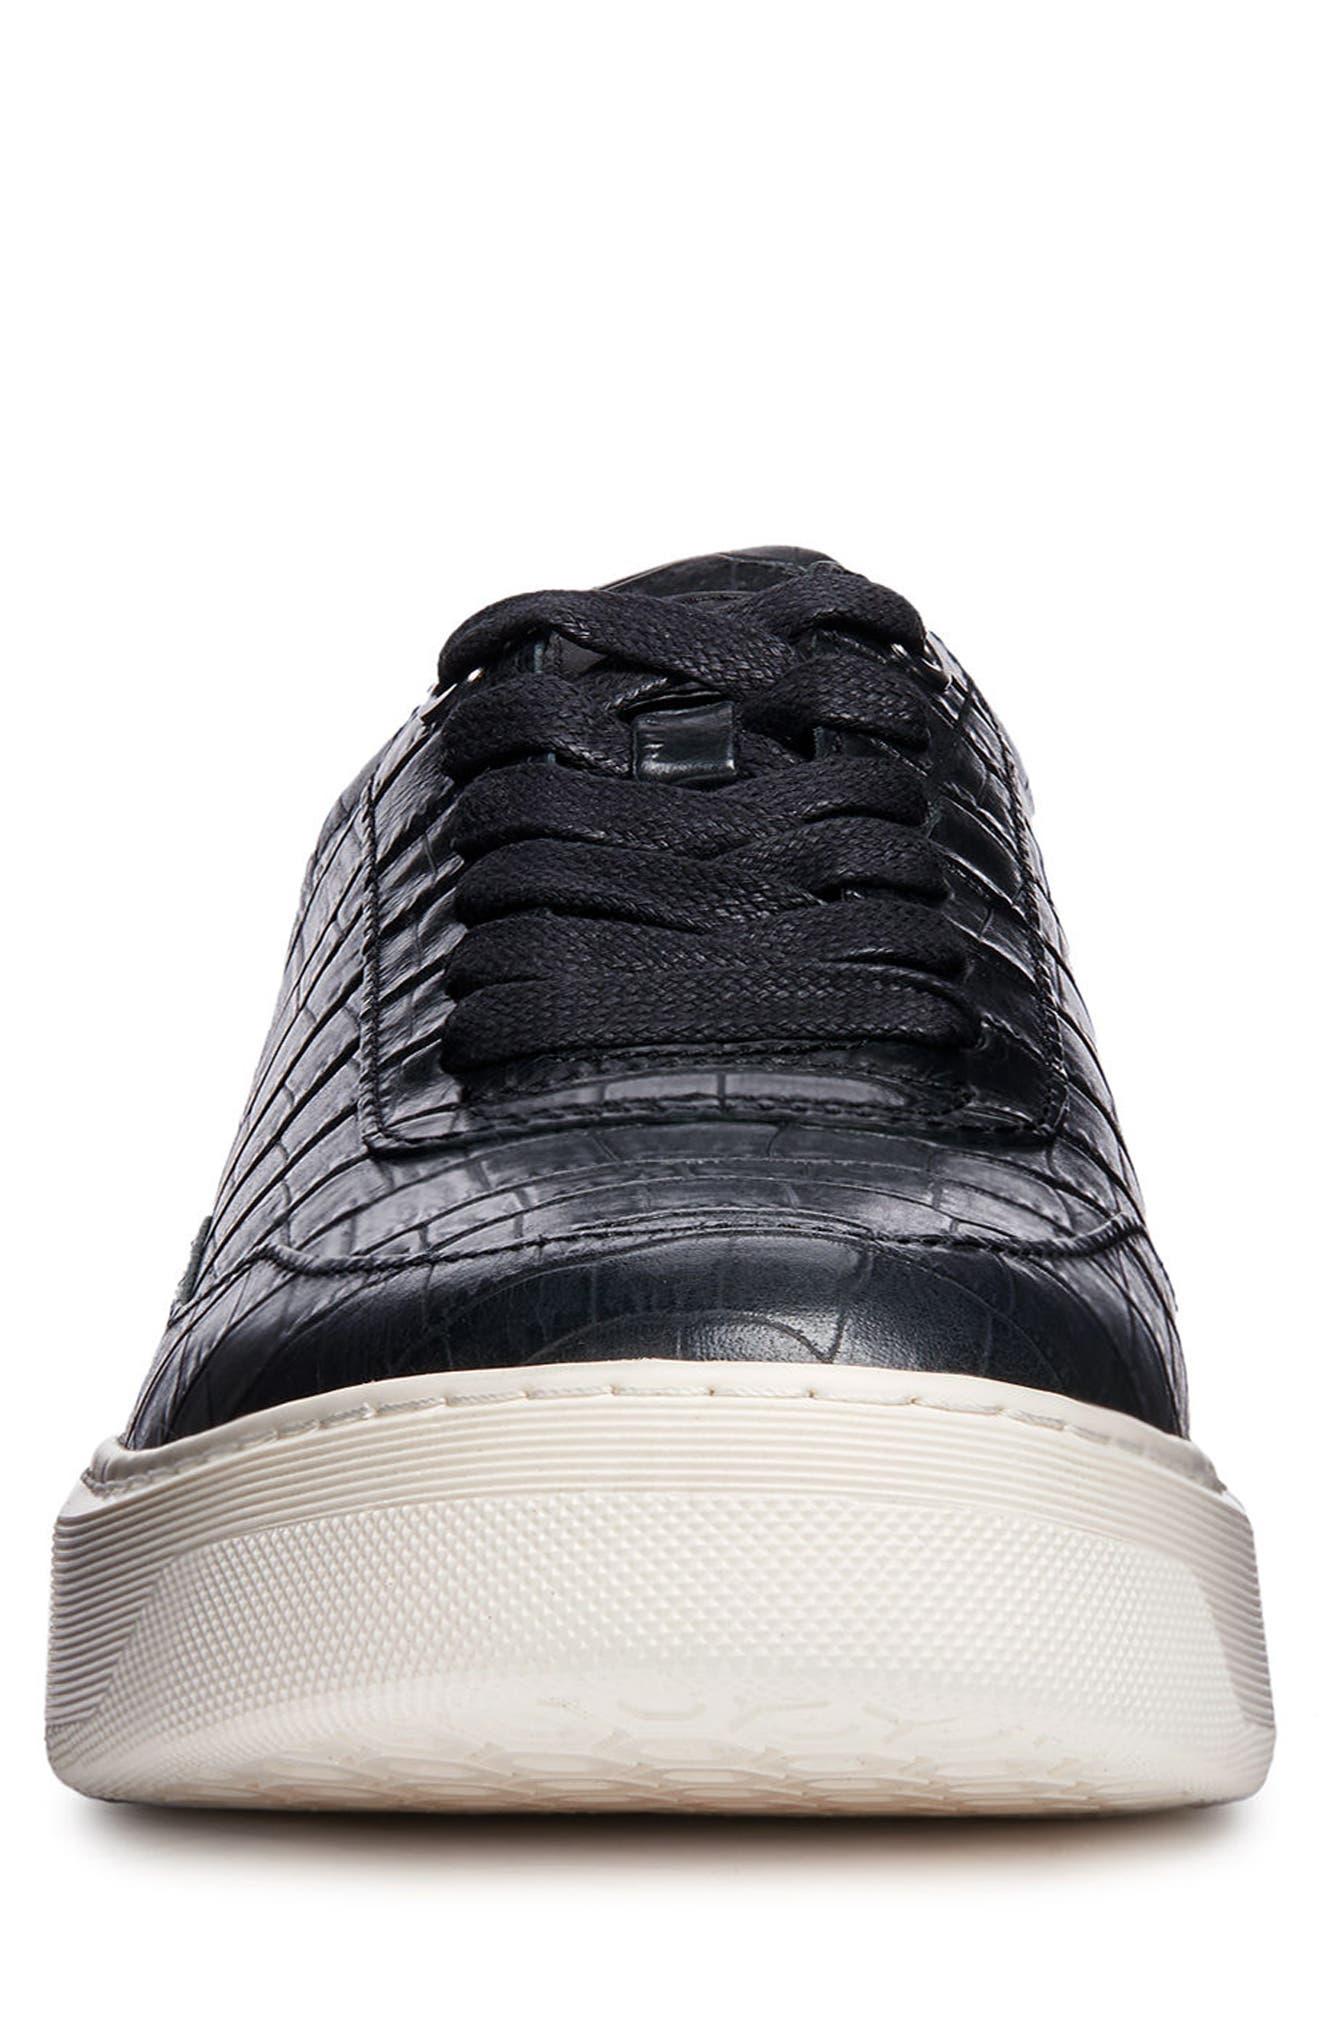 Deiven 8 Croc Textured Low Top Sneaker,                             Alternate thumbnail 4, color,                             BLACK LEATHER